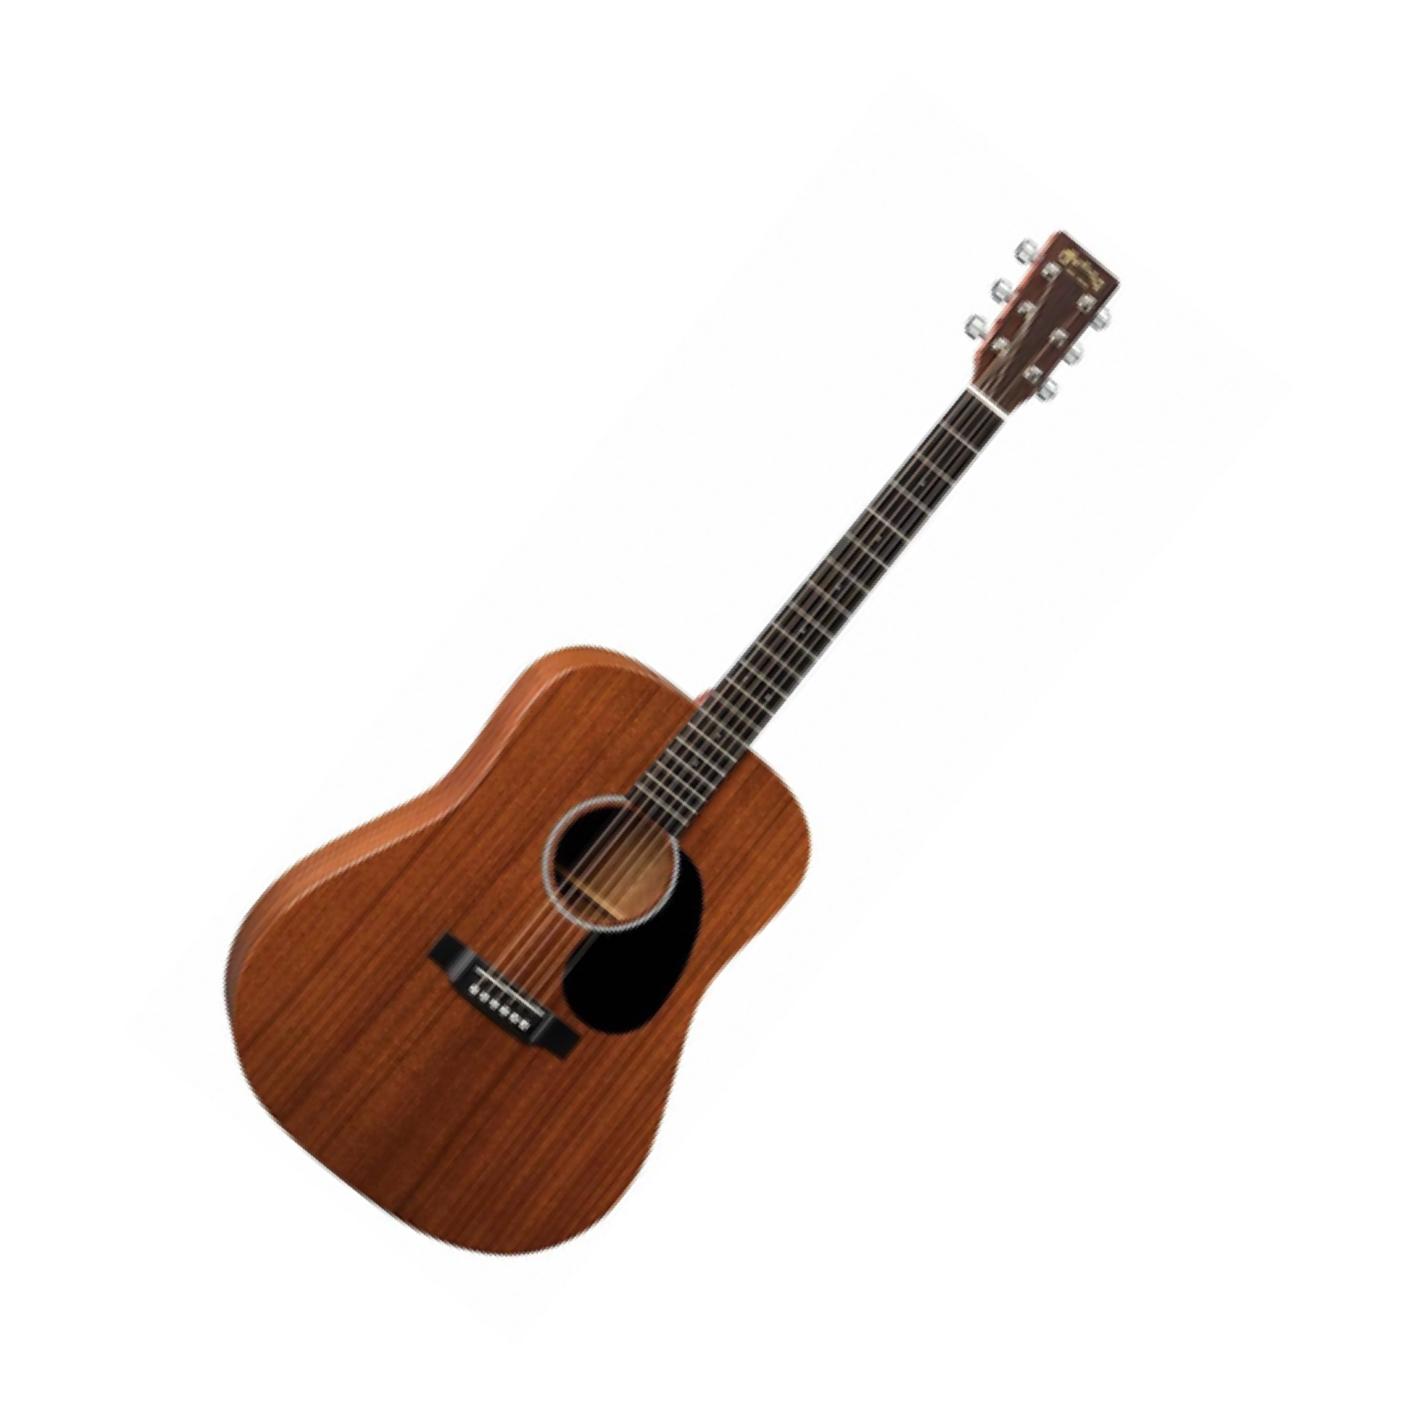 Martin DRS-1 Electro Acoustic inc Hard Case